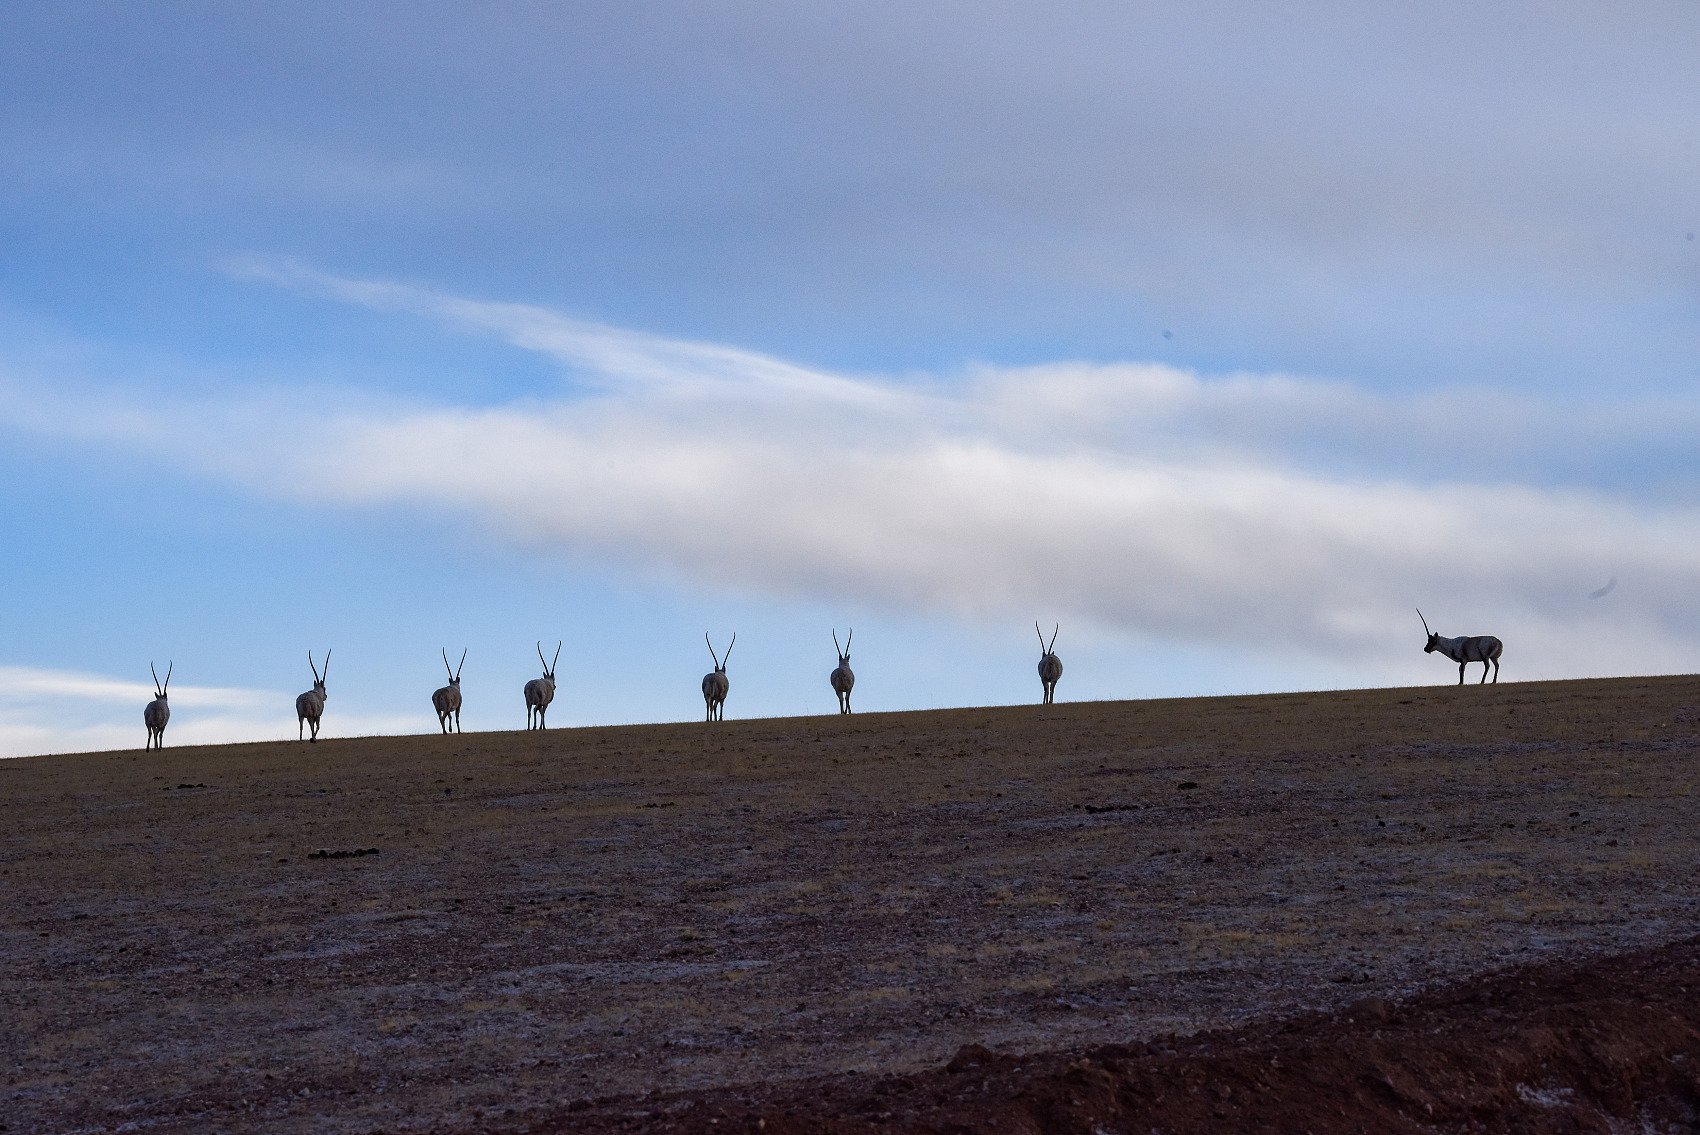 Monitoring system records migration of Tibetan antelopes